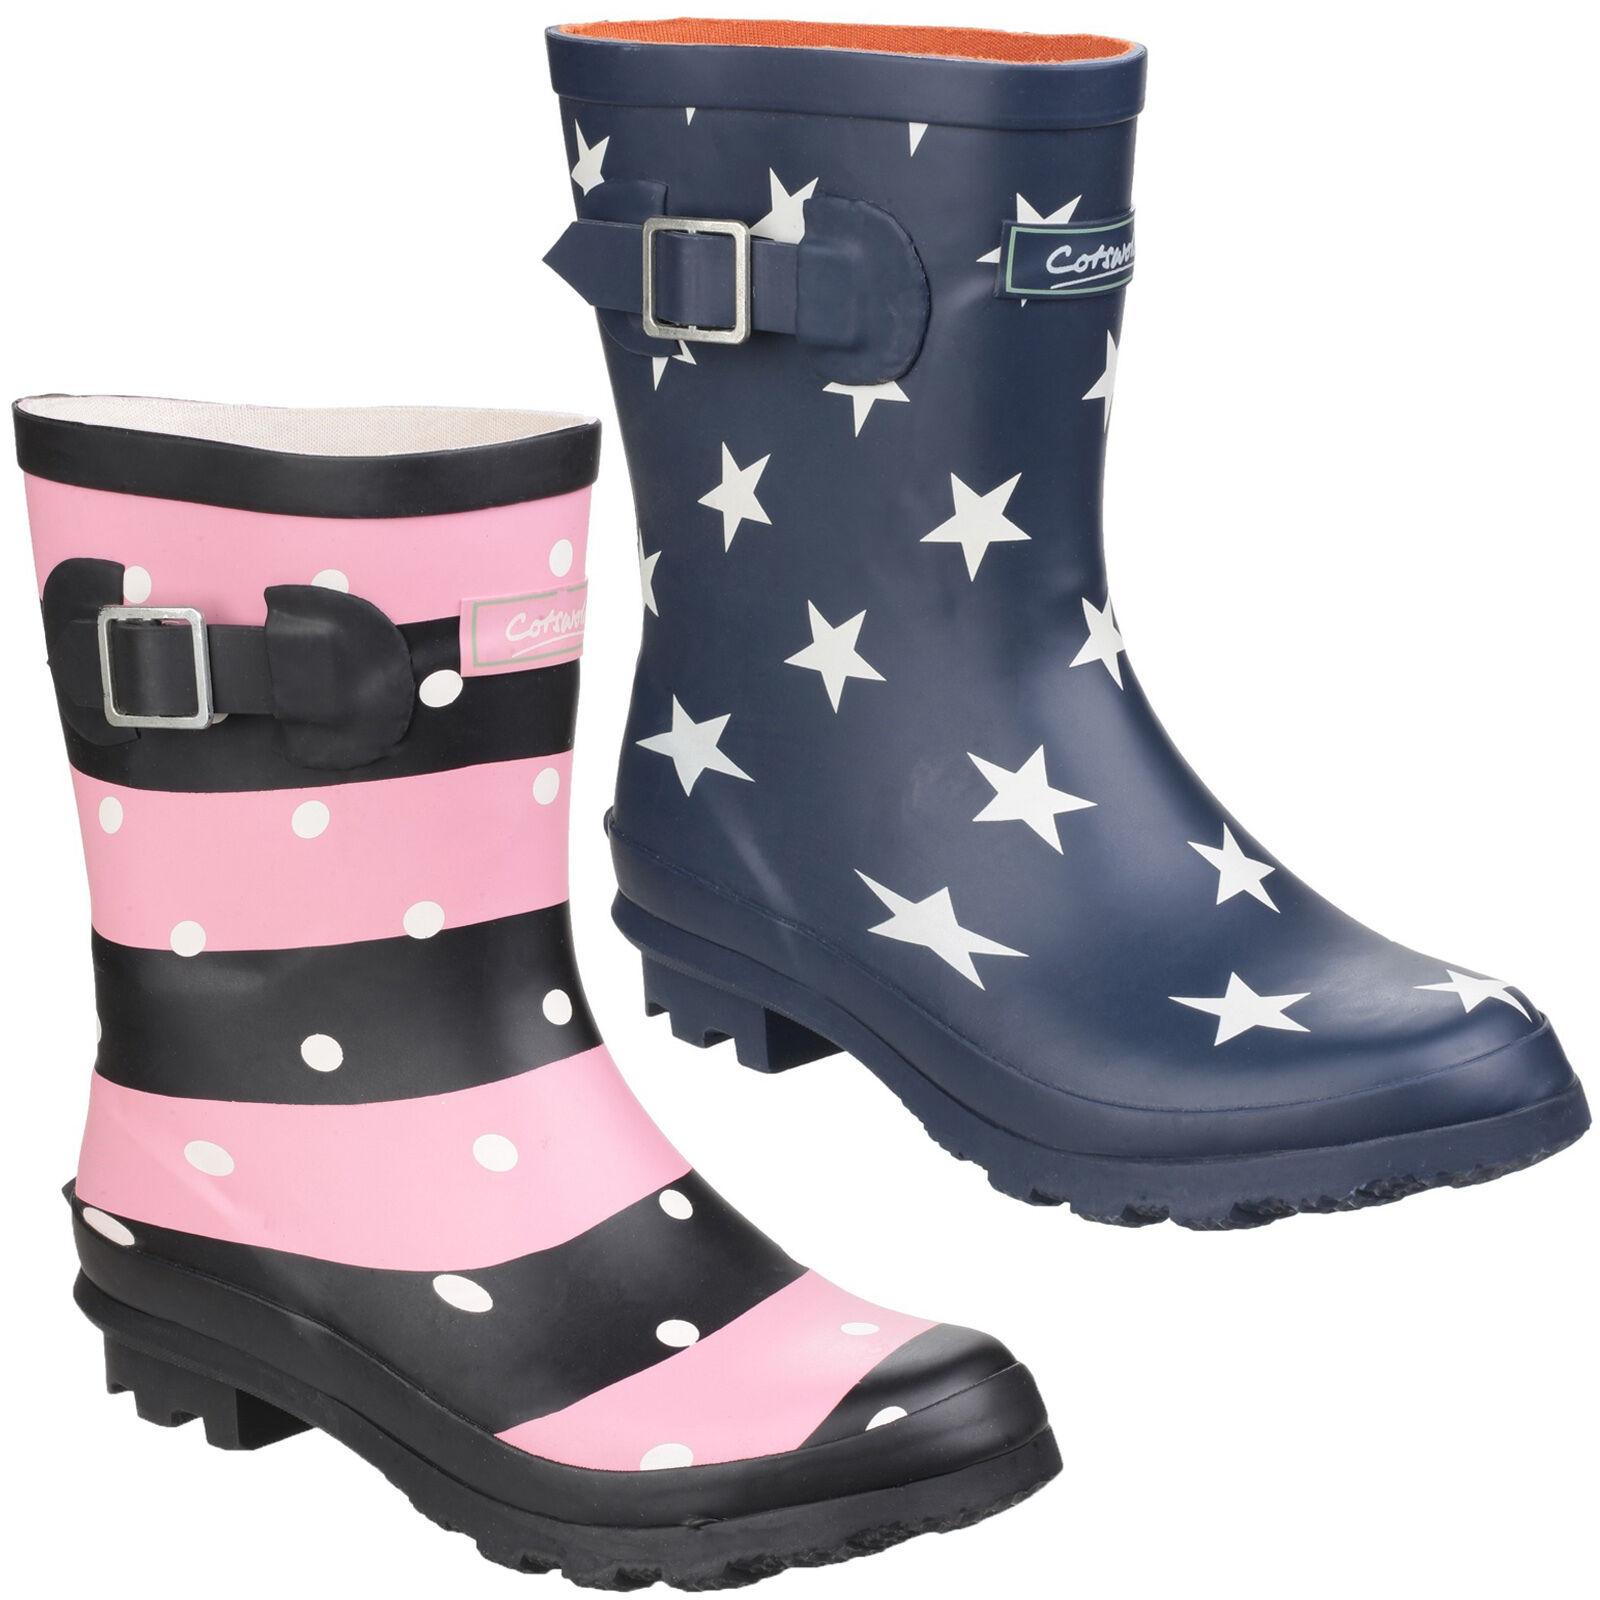 Cotswold Badminton Rubber Boots Womens Girls Waterproof Wellington Wellies UK3-8